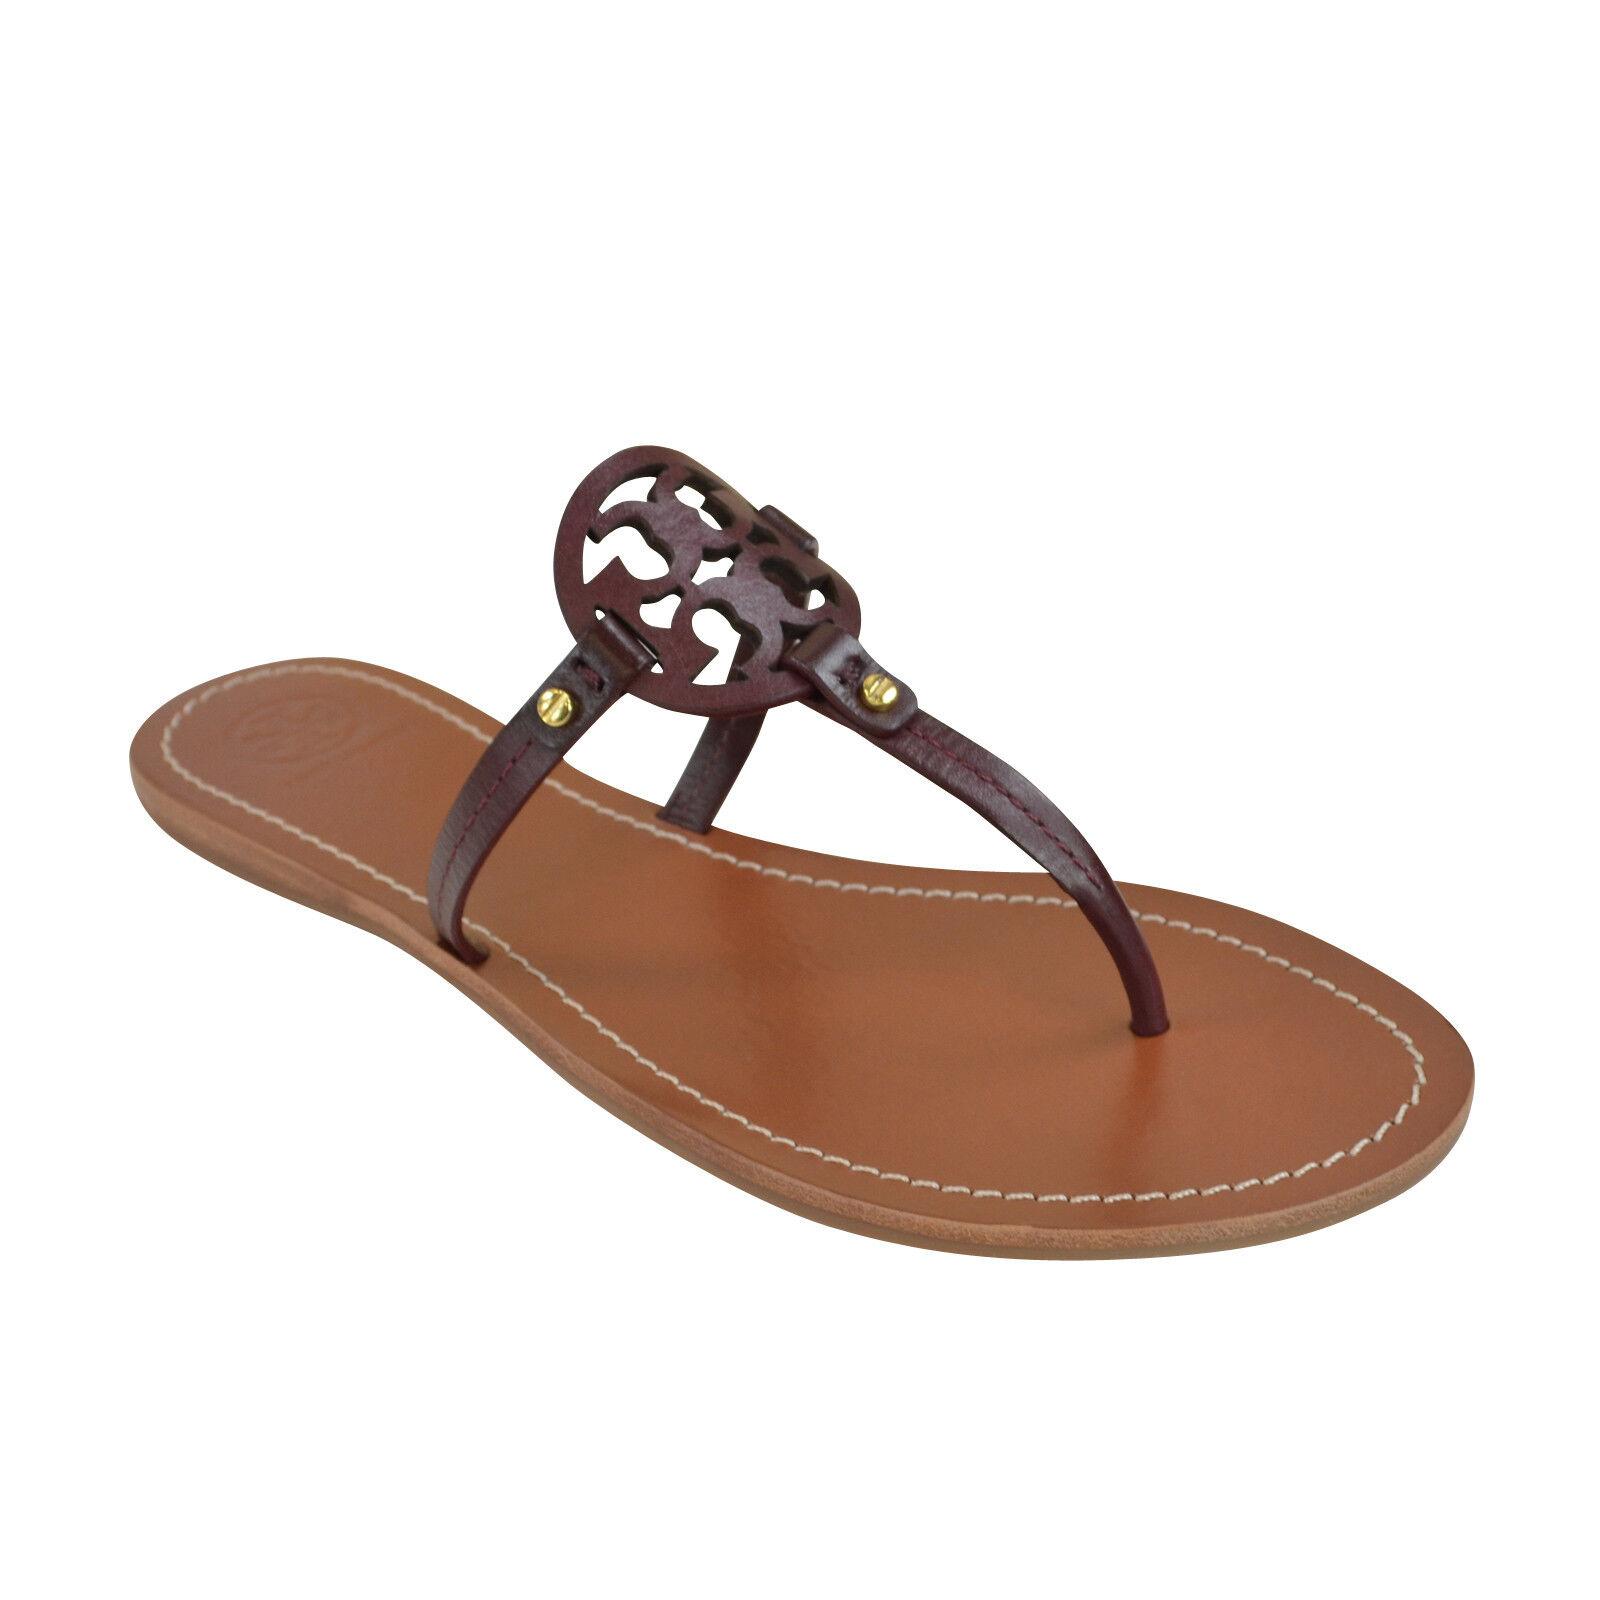 43936177e5bf Details about NIB Tory Burch Mini Millder Thong Sandals Oxblood Pick a size